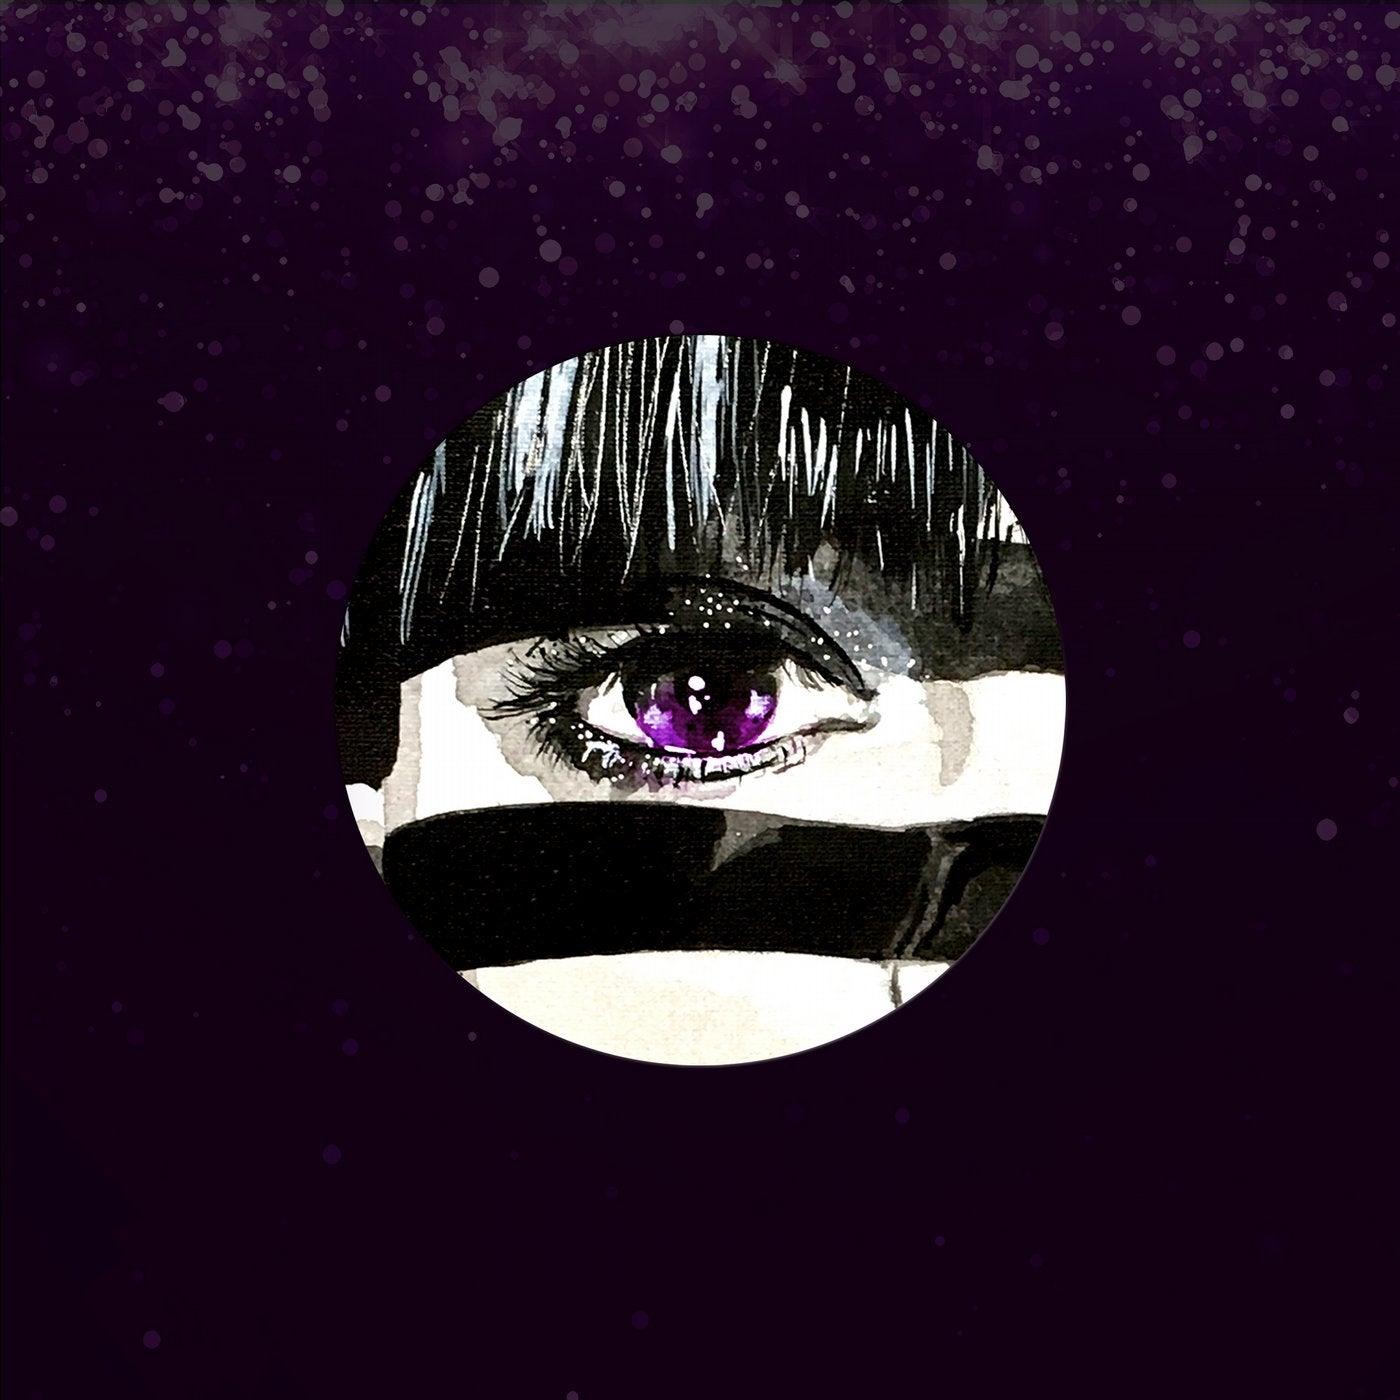 Hypnotized (Extended Mix)